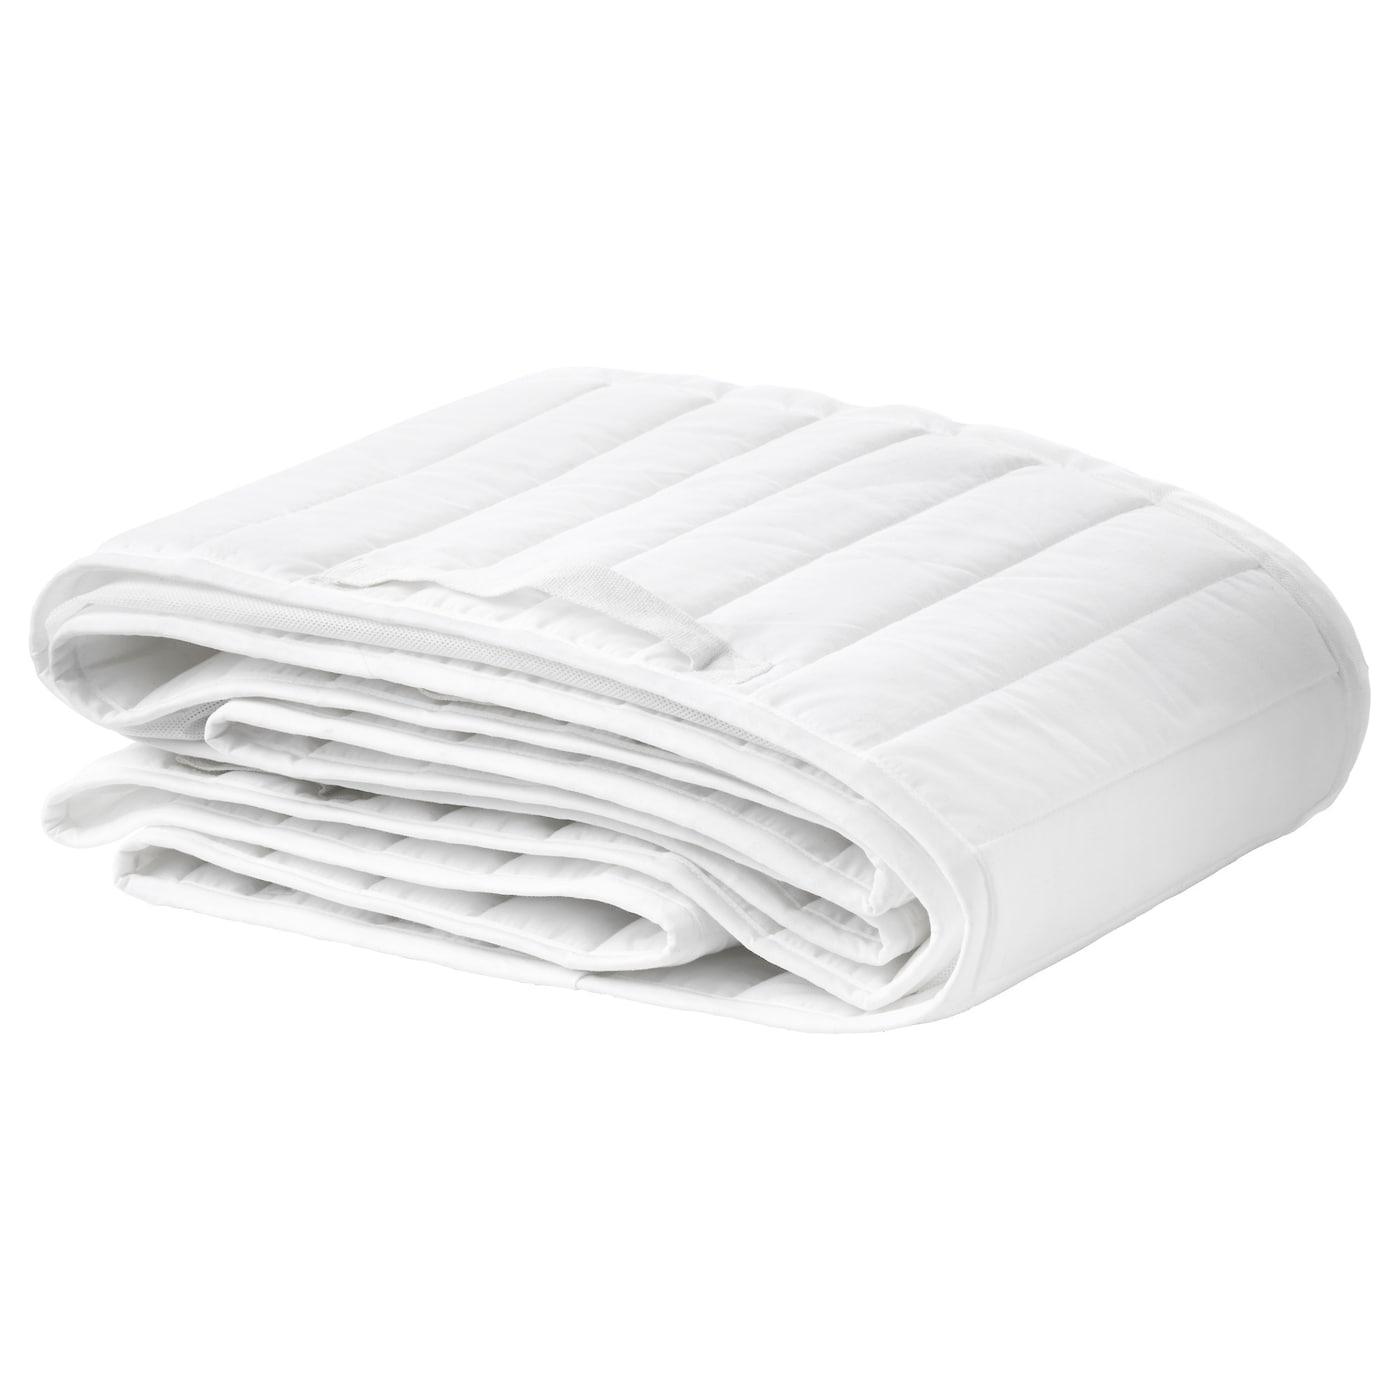 Cot bed mattresses crib mattresses ikea for Lit 70x140 ikea